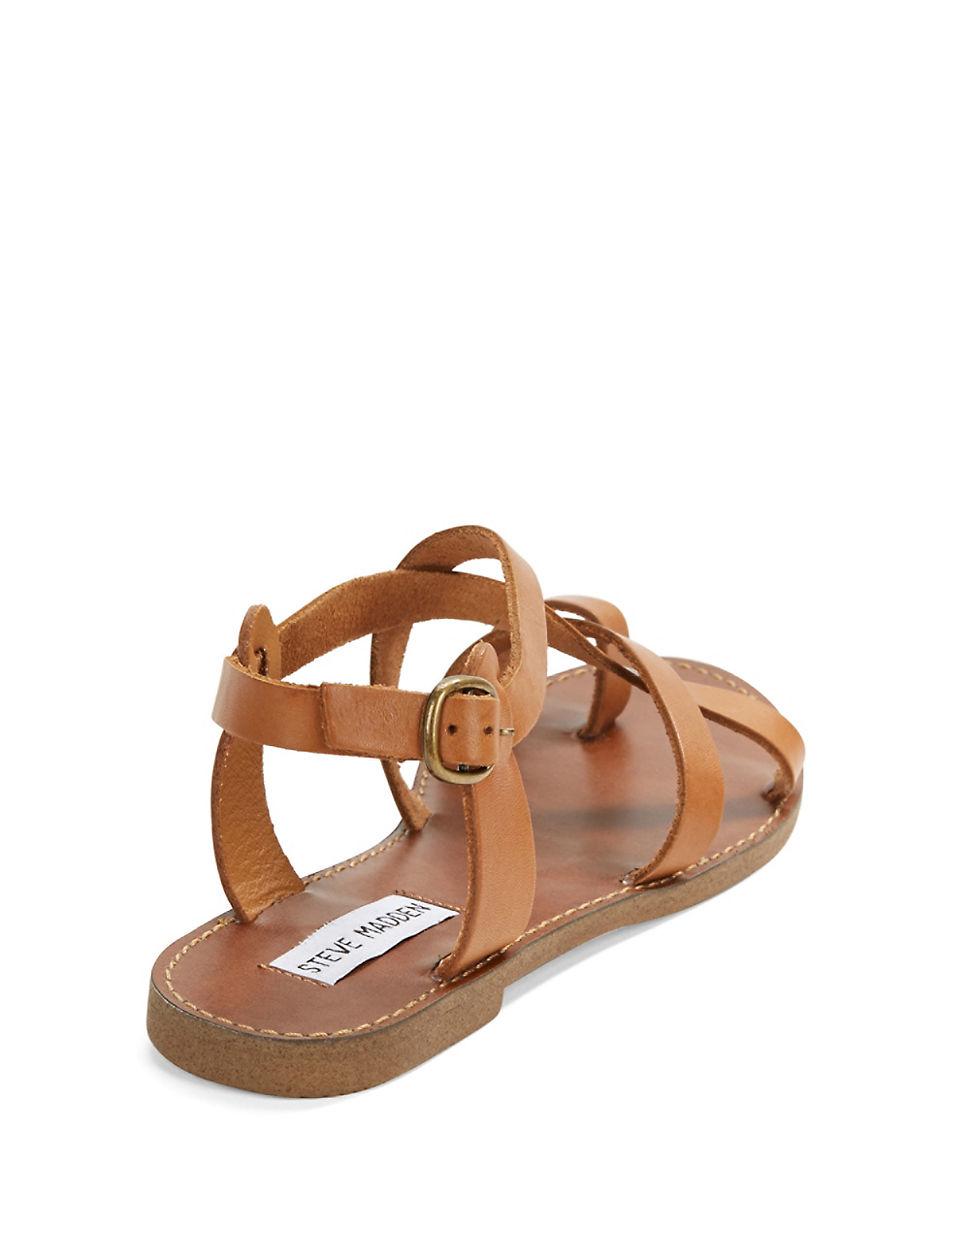 steve madden agathist leather strappy sandals in brown lyst. Black Bedroom Furniture Sets. Home Design Ideas